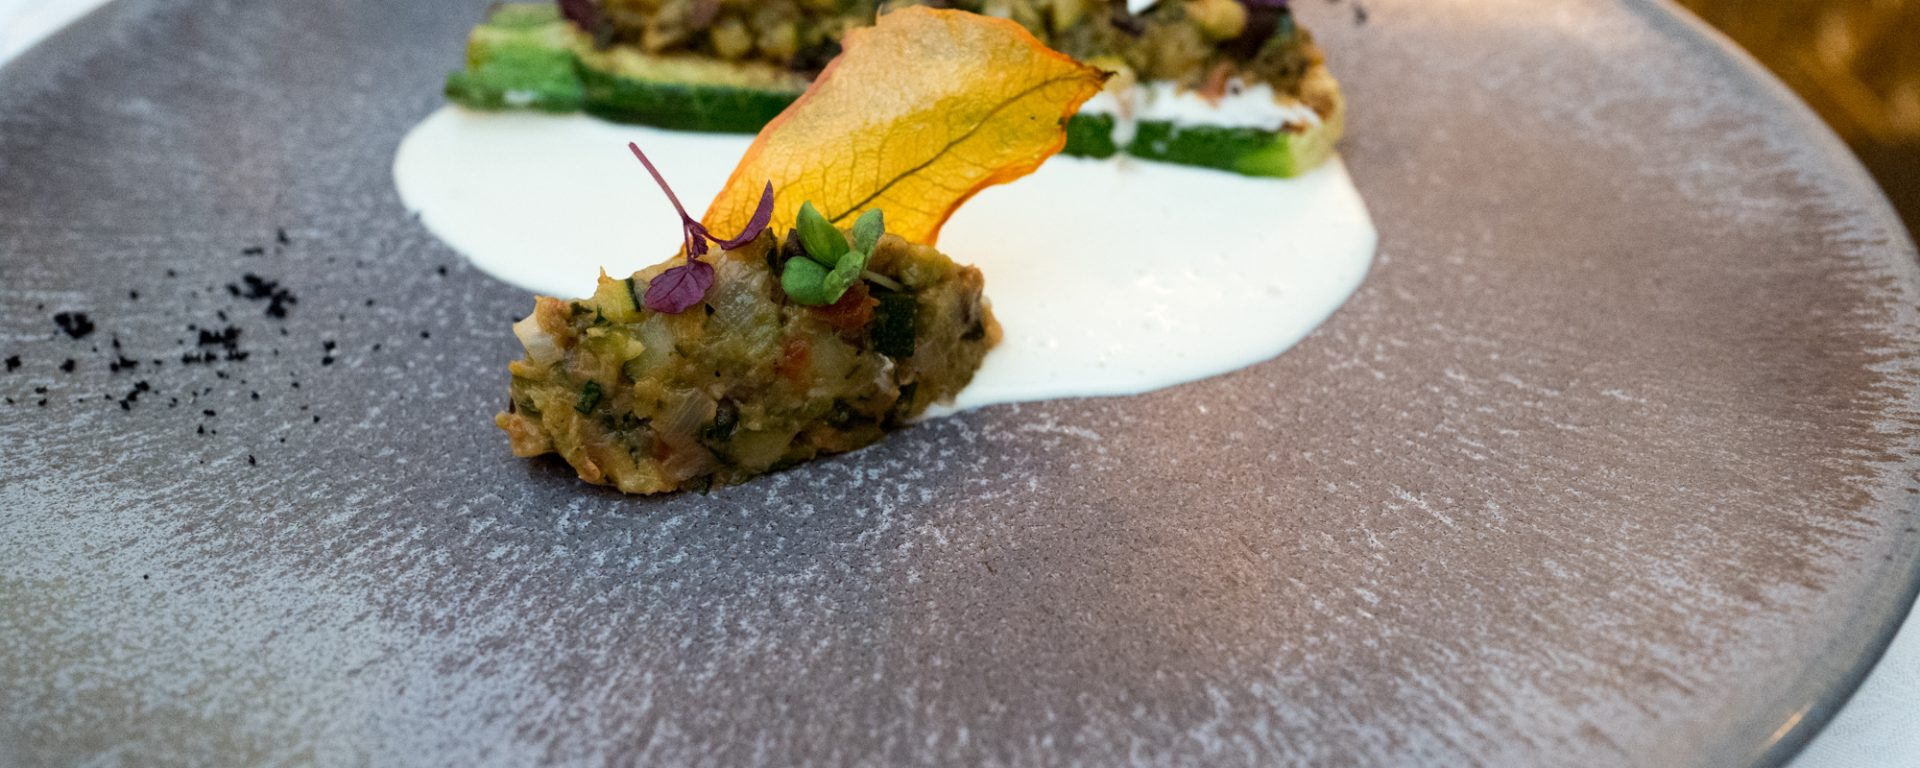 Lanesborough London - Celeste restaurant